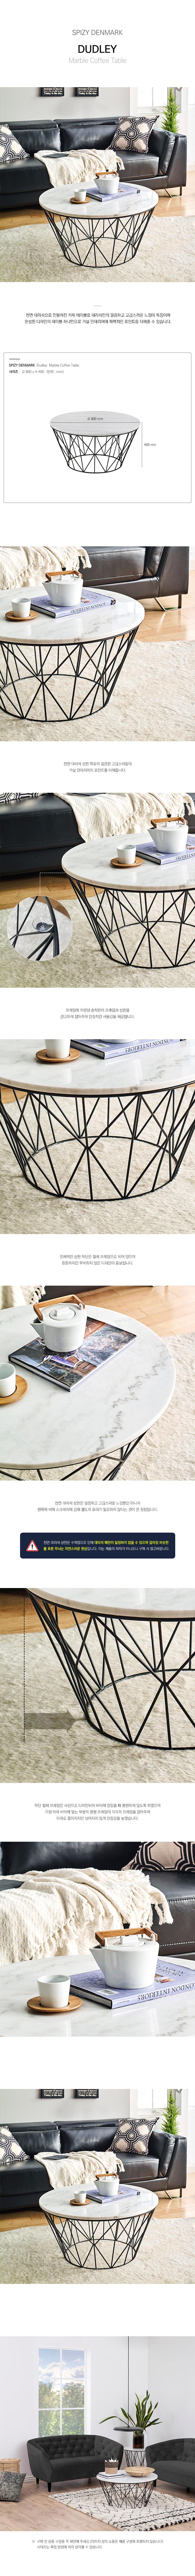 Dudley Coffee Table_180628.jpg